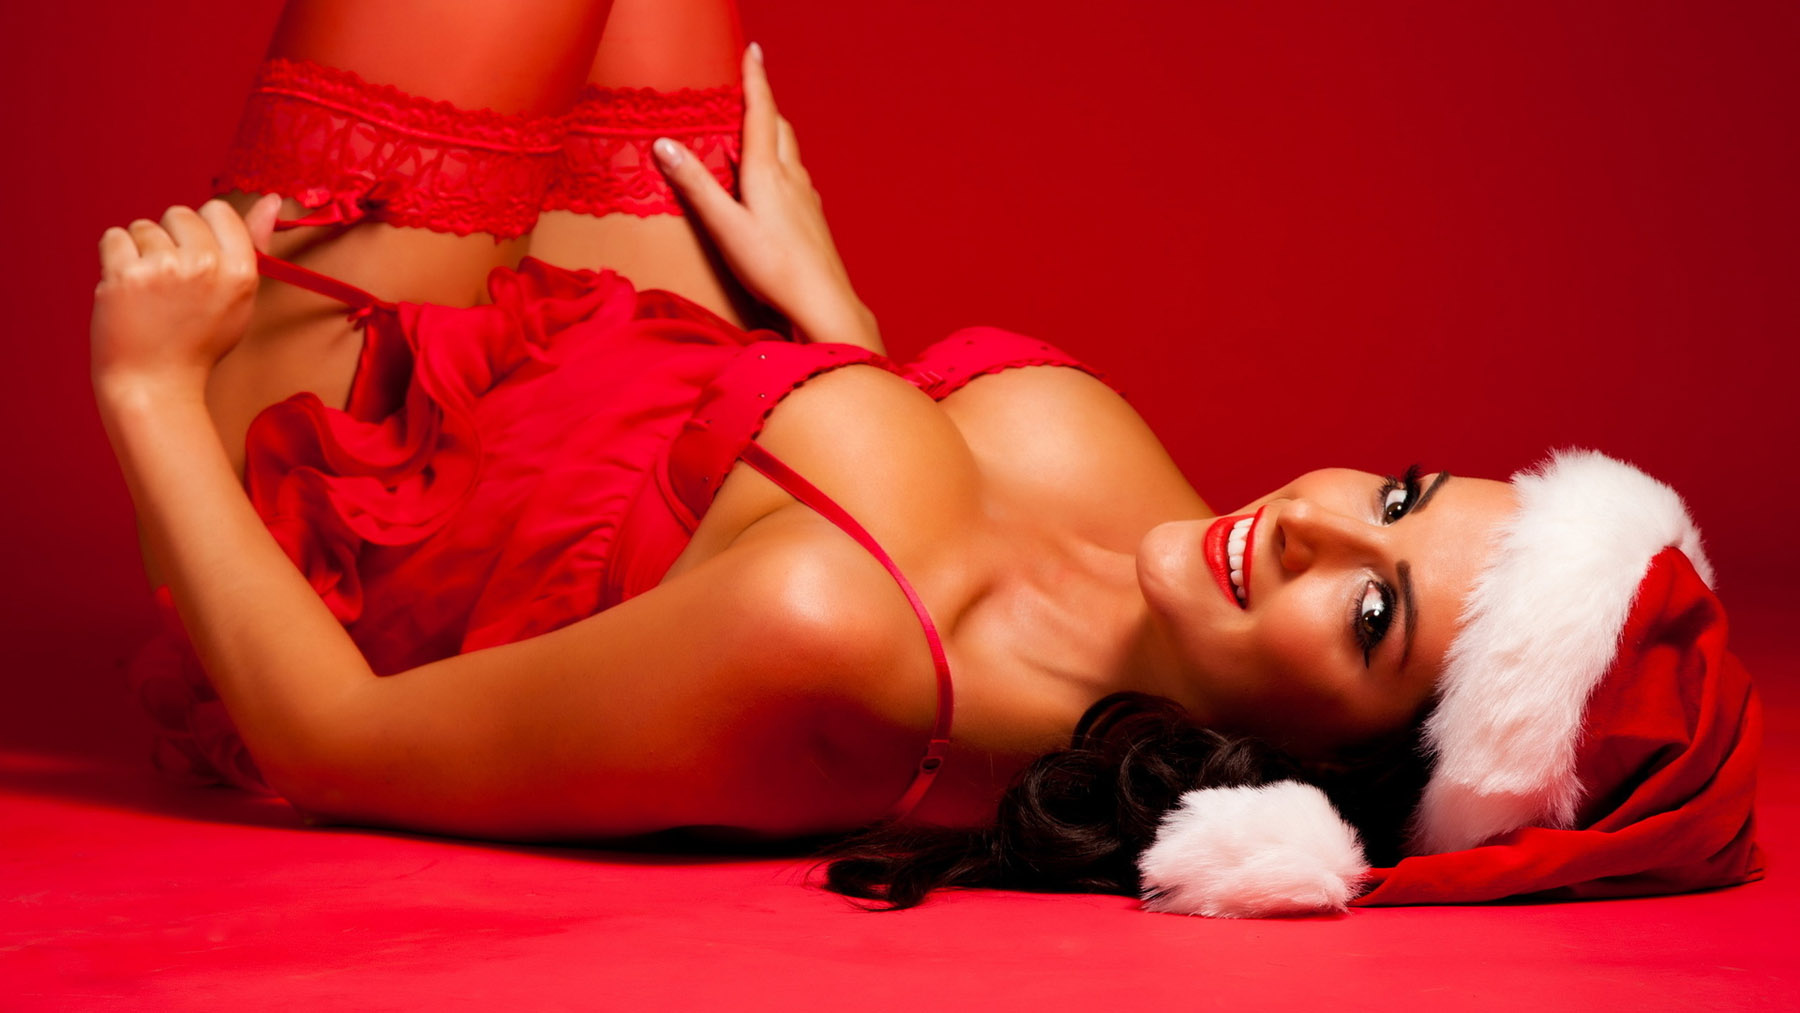 naked-christmas-wallpaper-sex